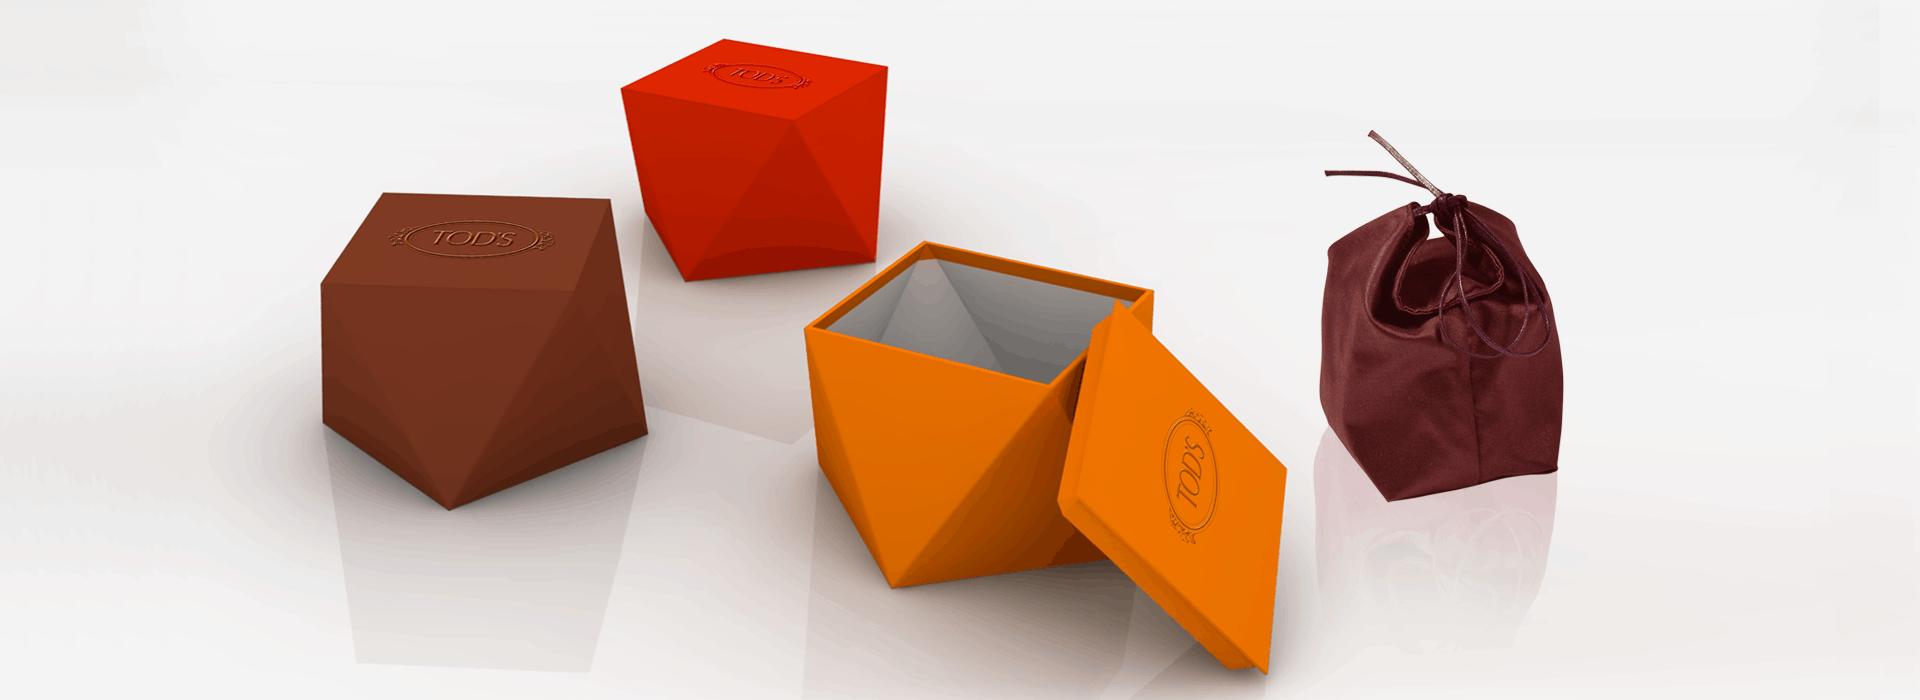 ondesign-brand-design-projectslider03